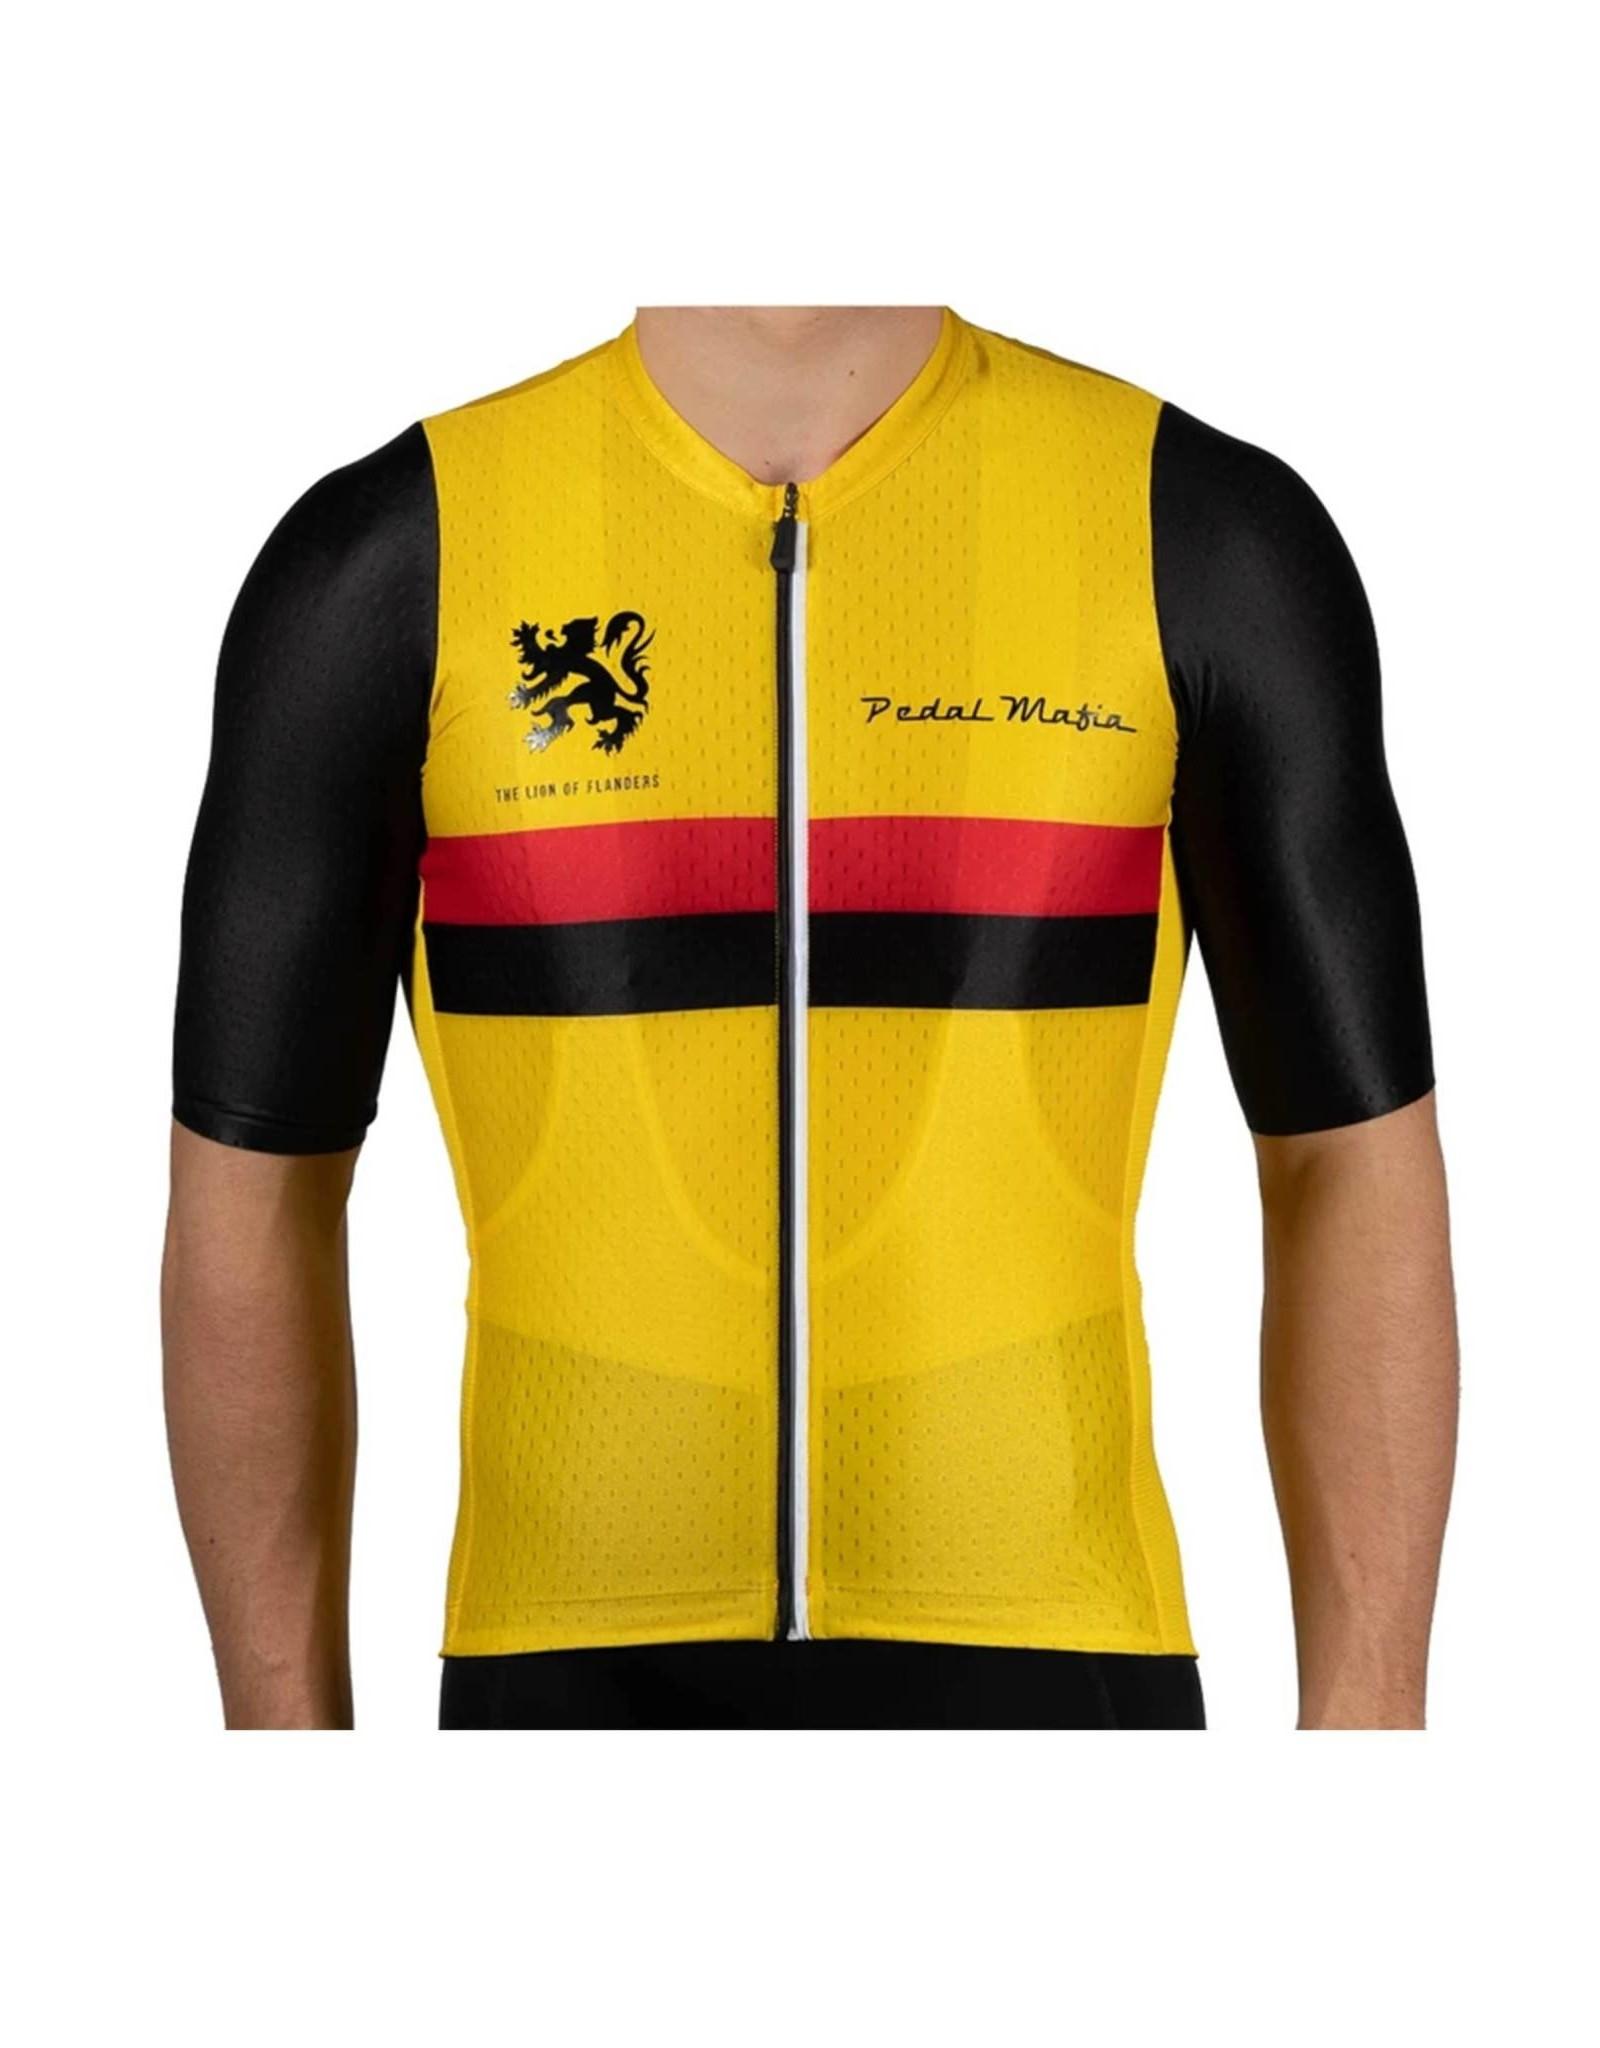 Pedal Mafia Mens V3 Flanders Jersey